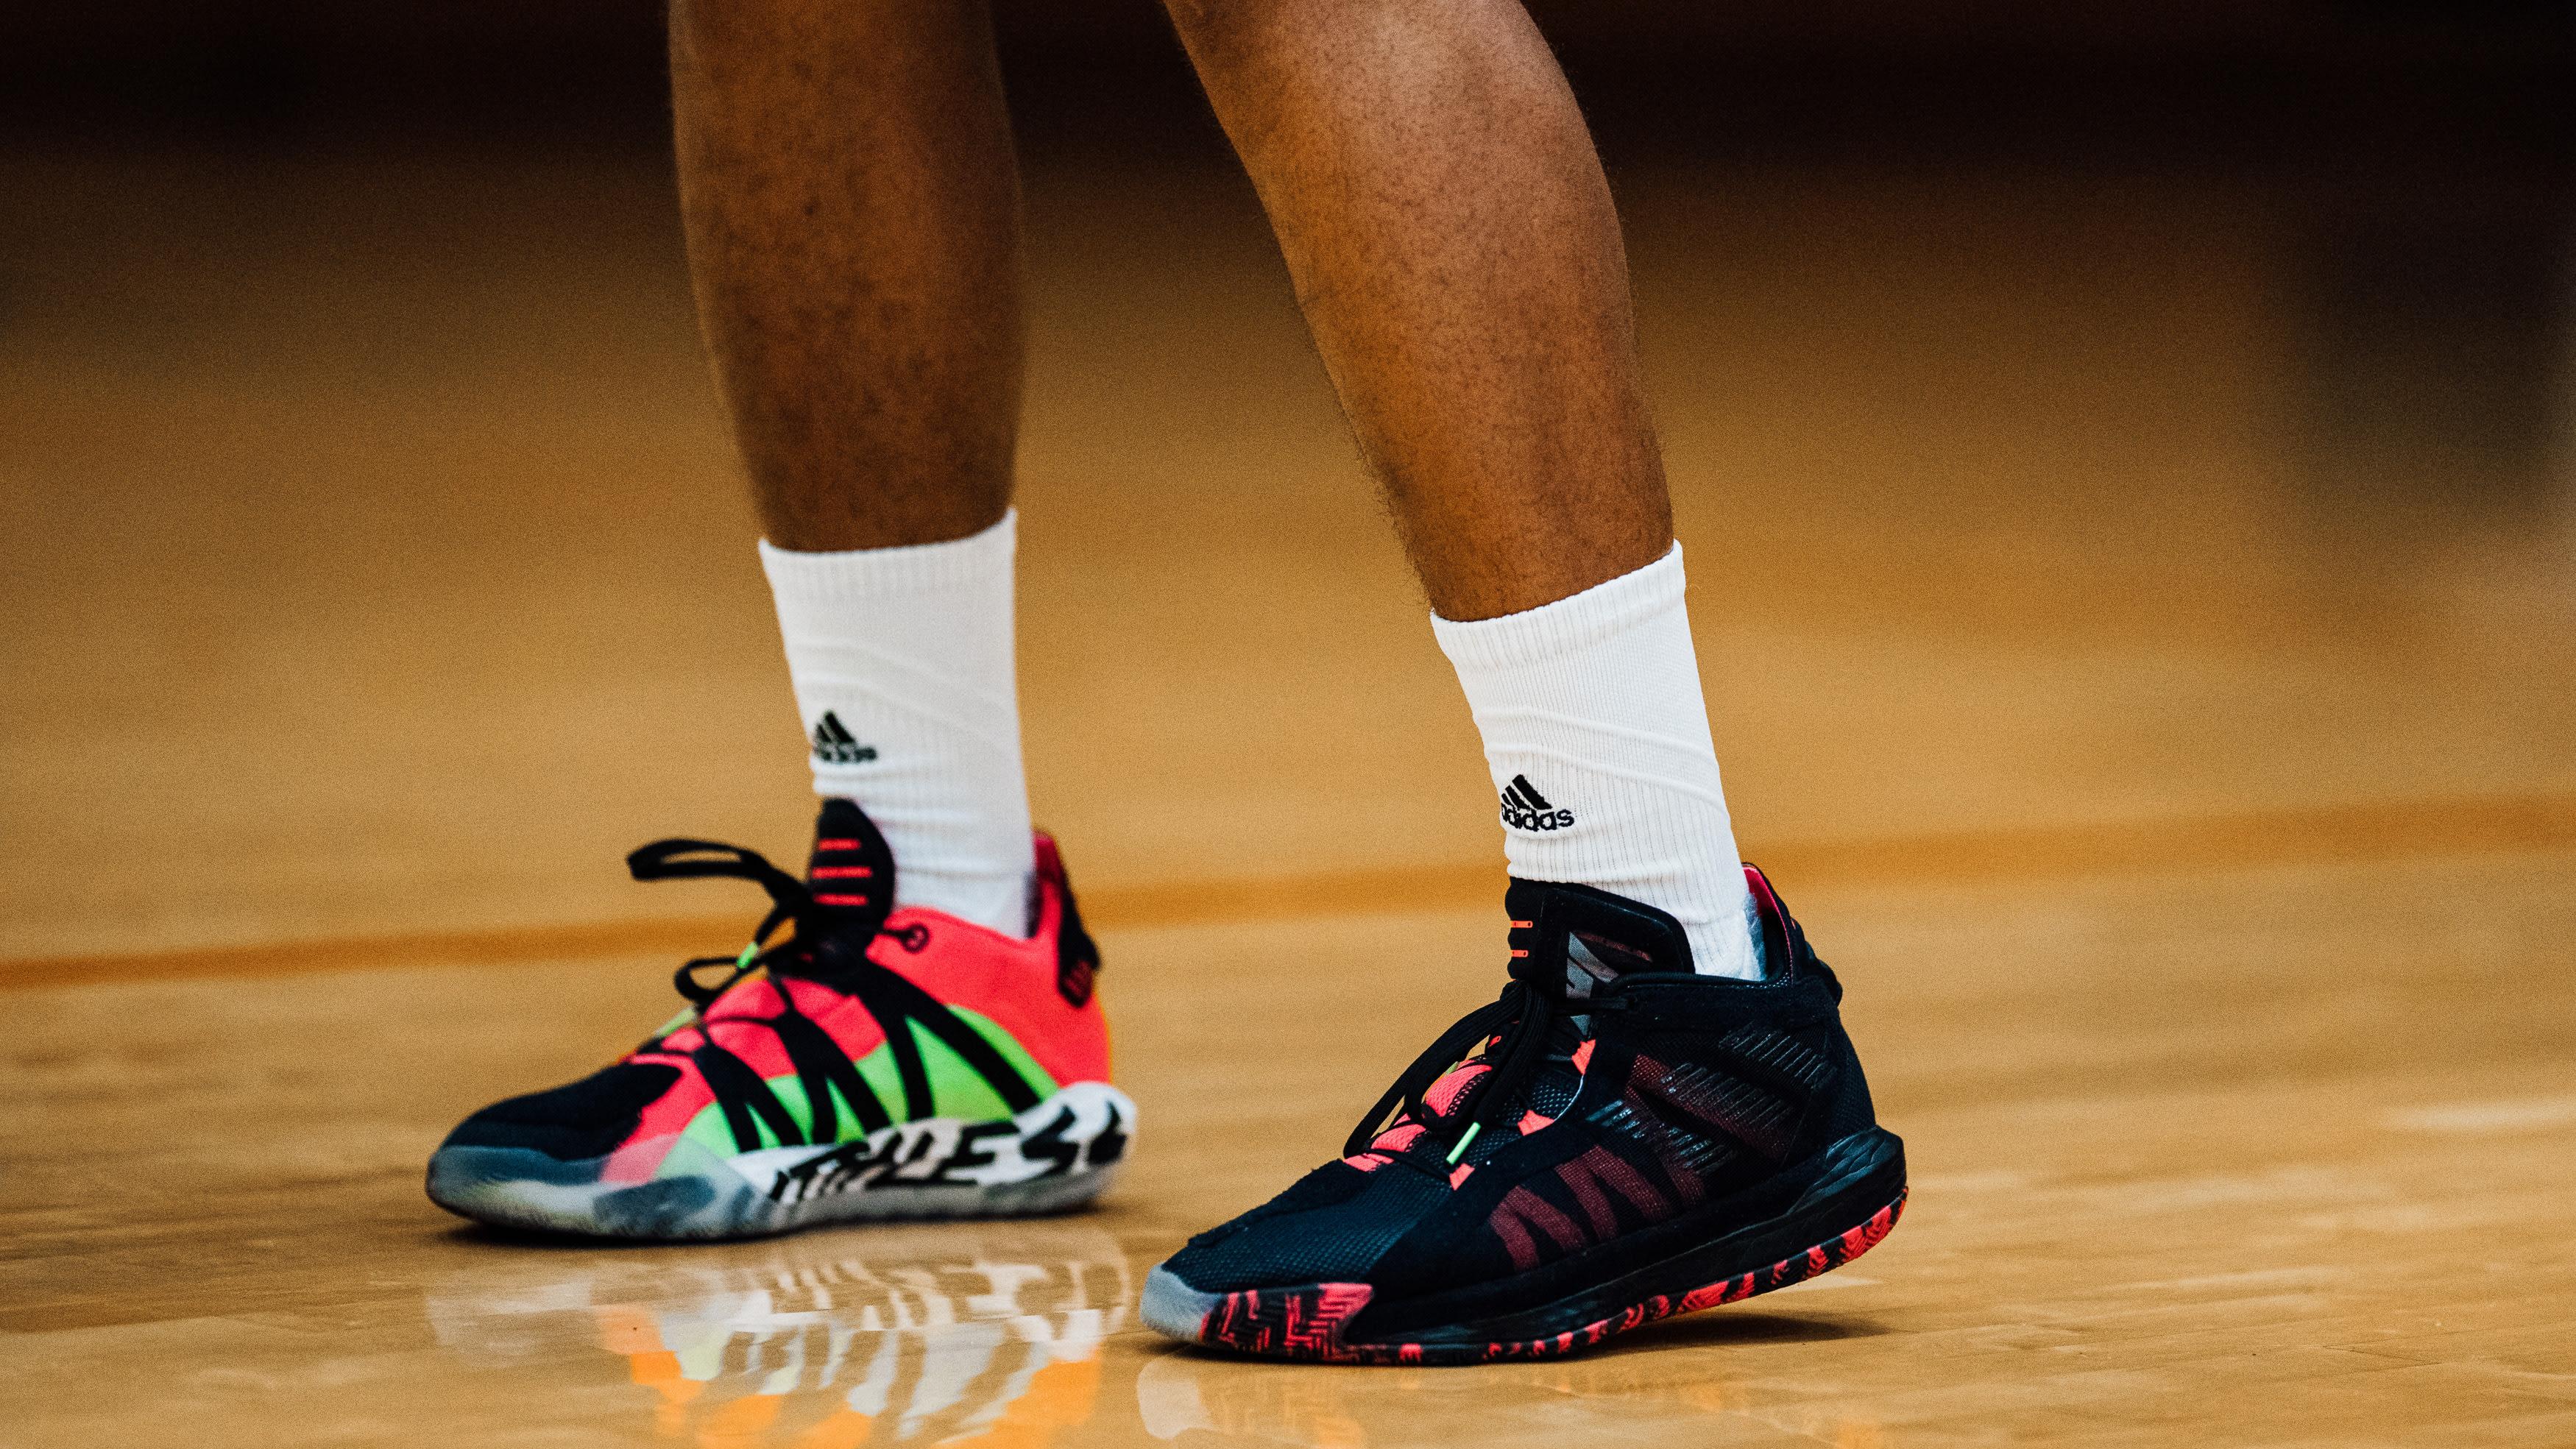 adidas-dame-6-ruthless-on-feet-damian-lillard